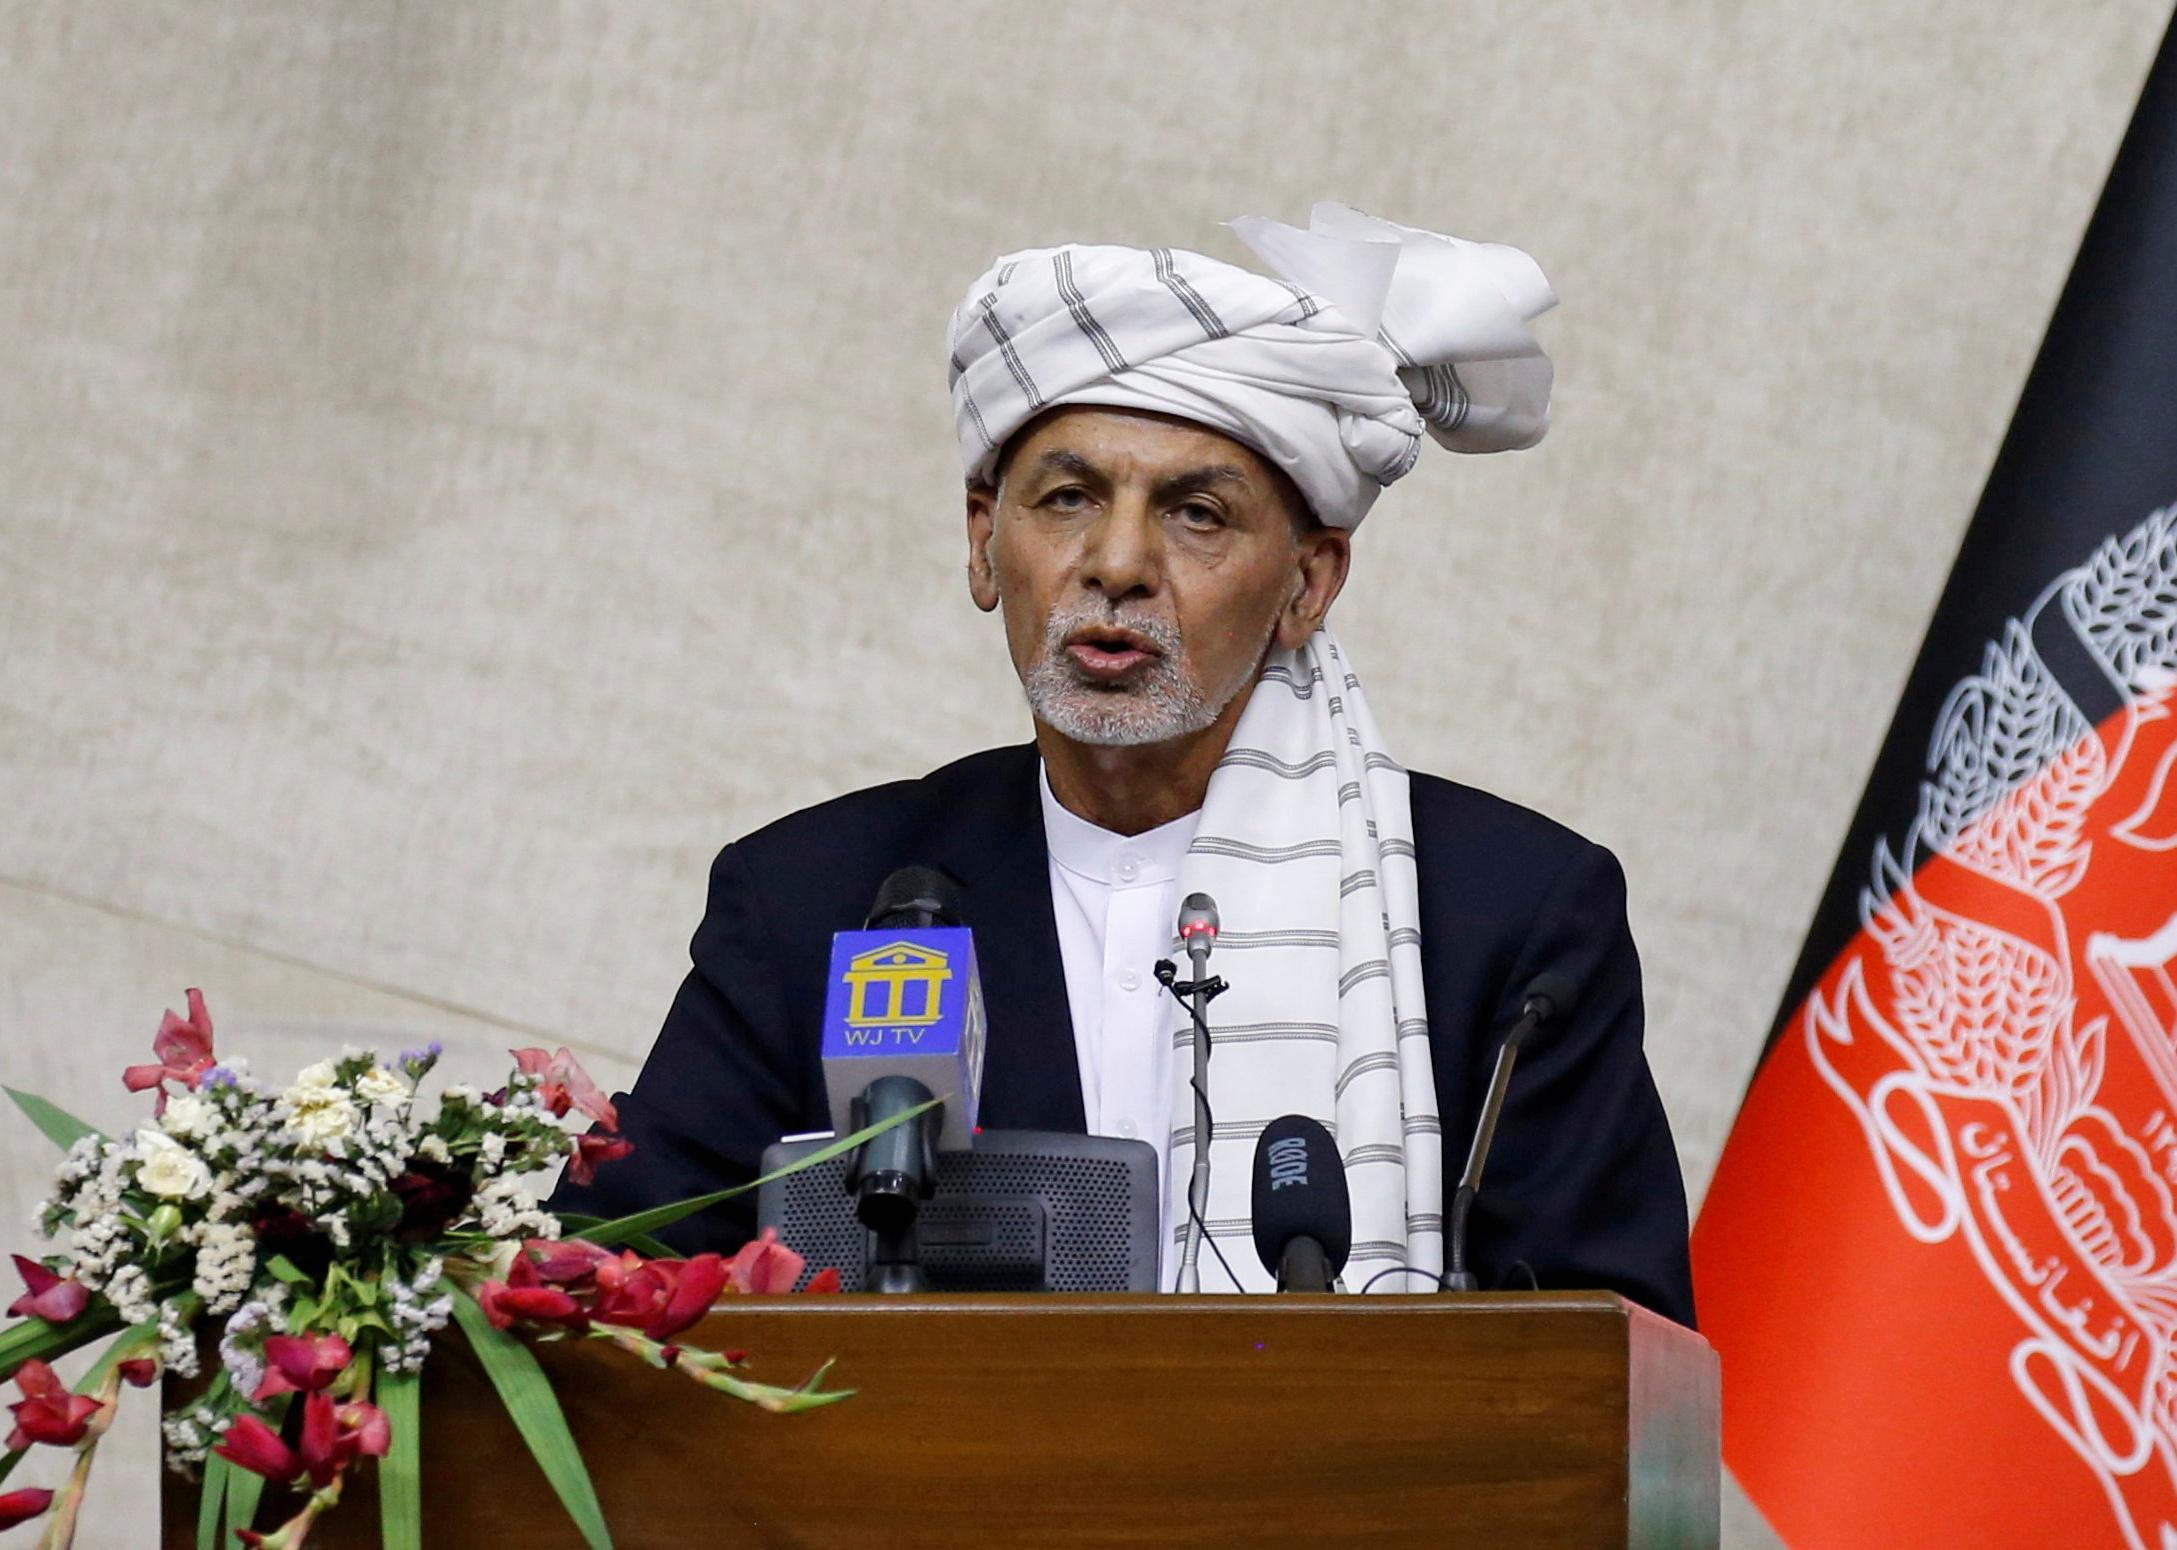 Afghan President Ashraf Ghani speaks at the parliament in Kabul, Afghanistan August 2, 2021. REUTERS/Stringer/File Photo